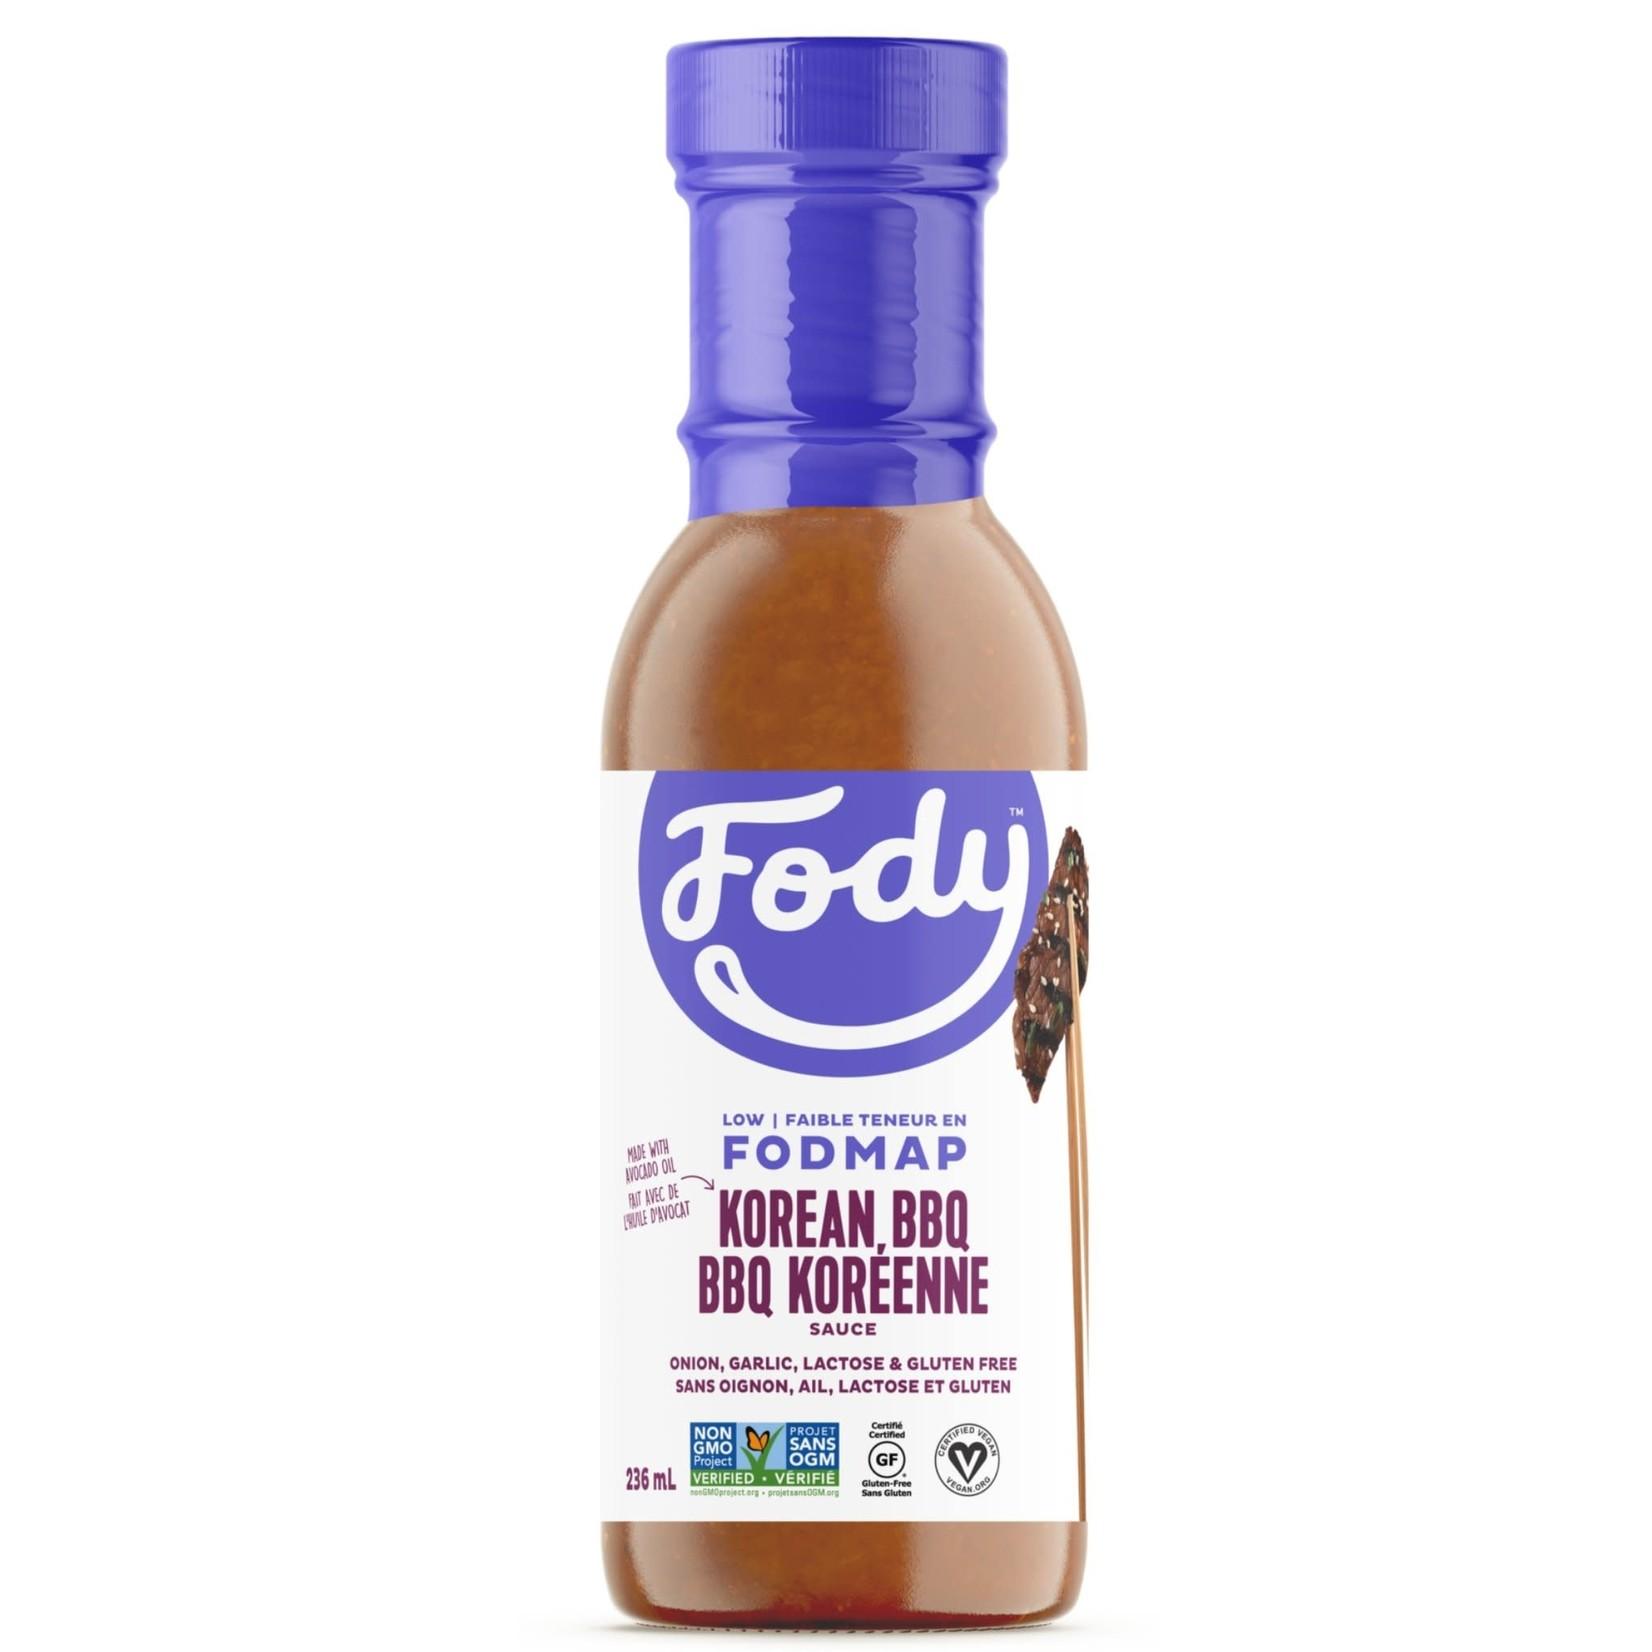 Fody Food Co. Fody Korean BBQ Sauce 236ml